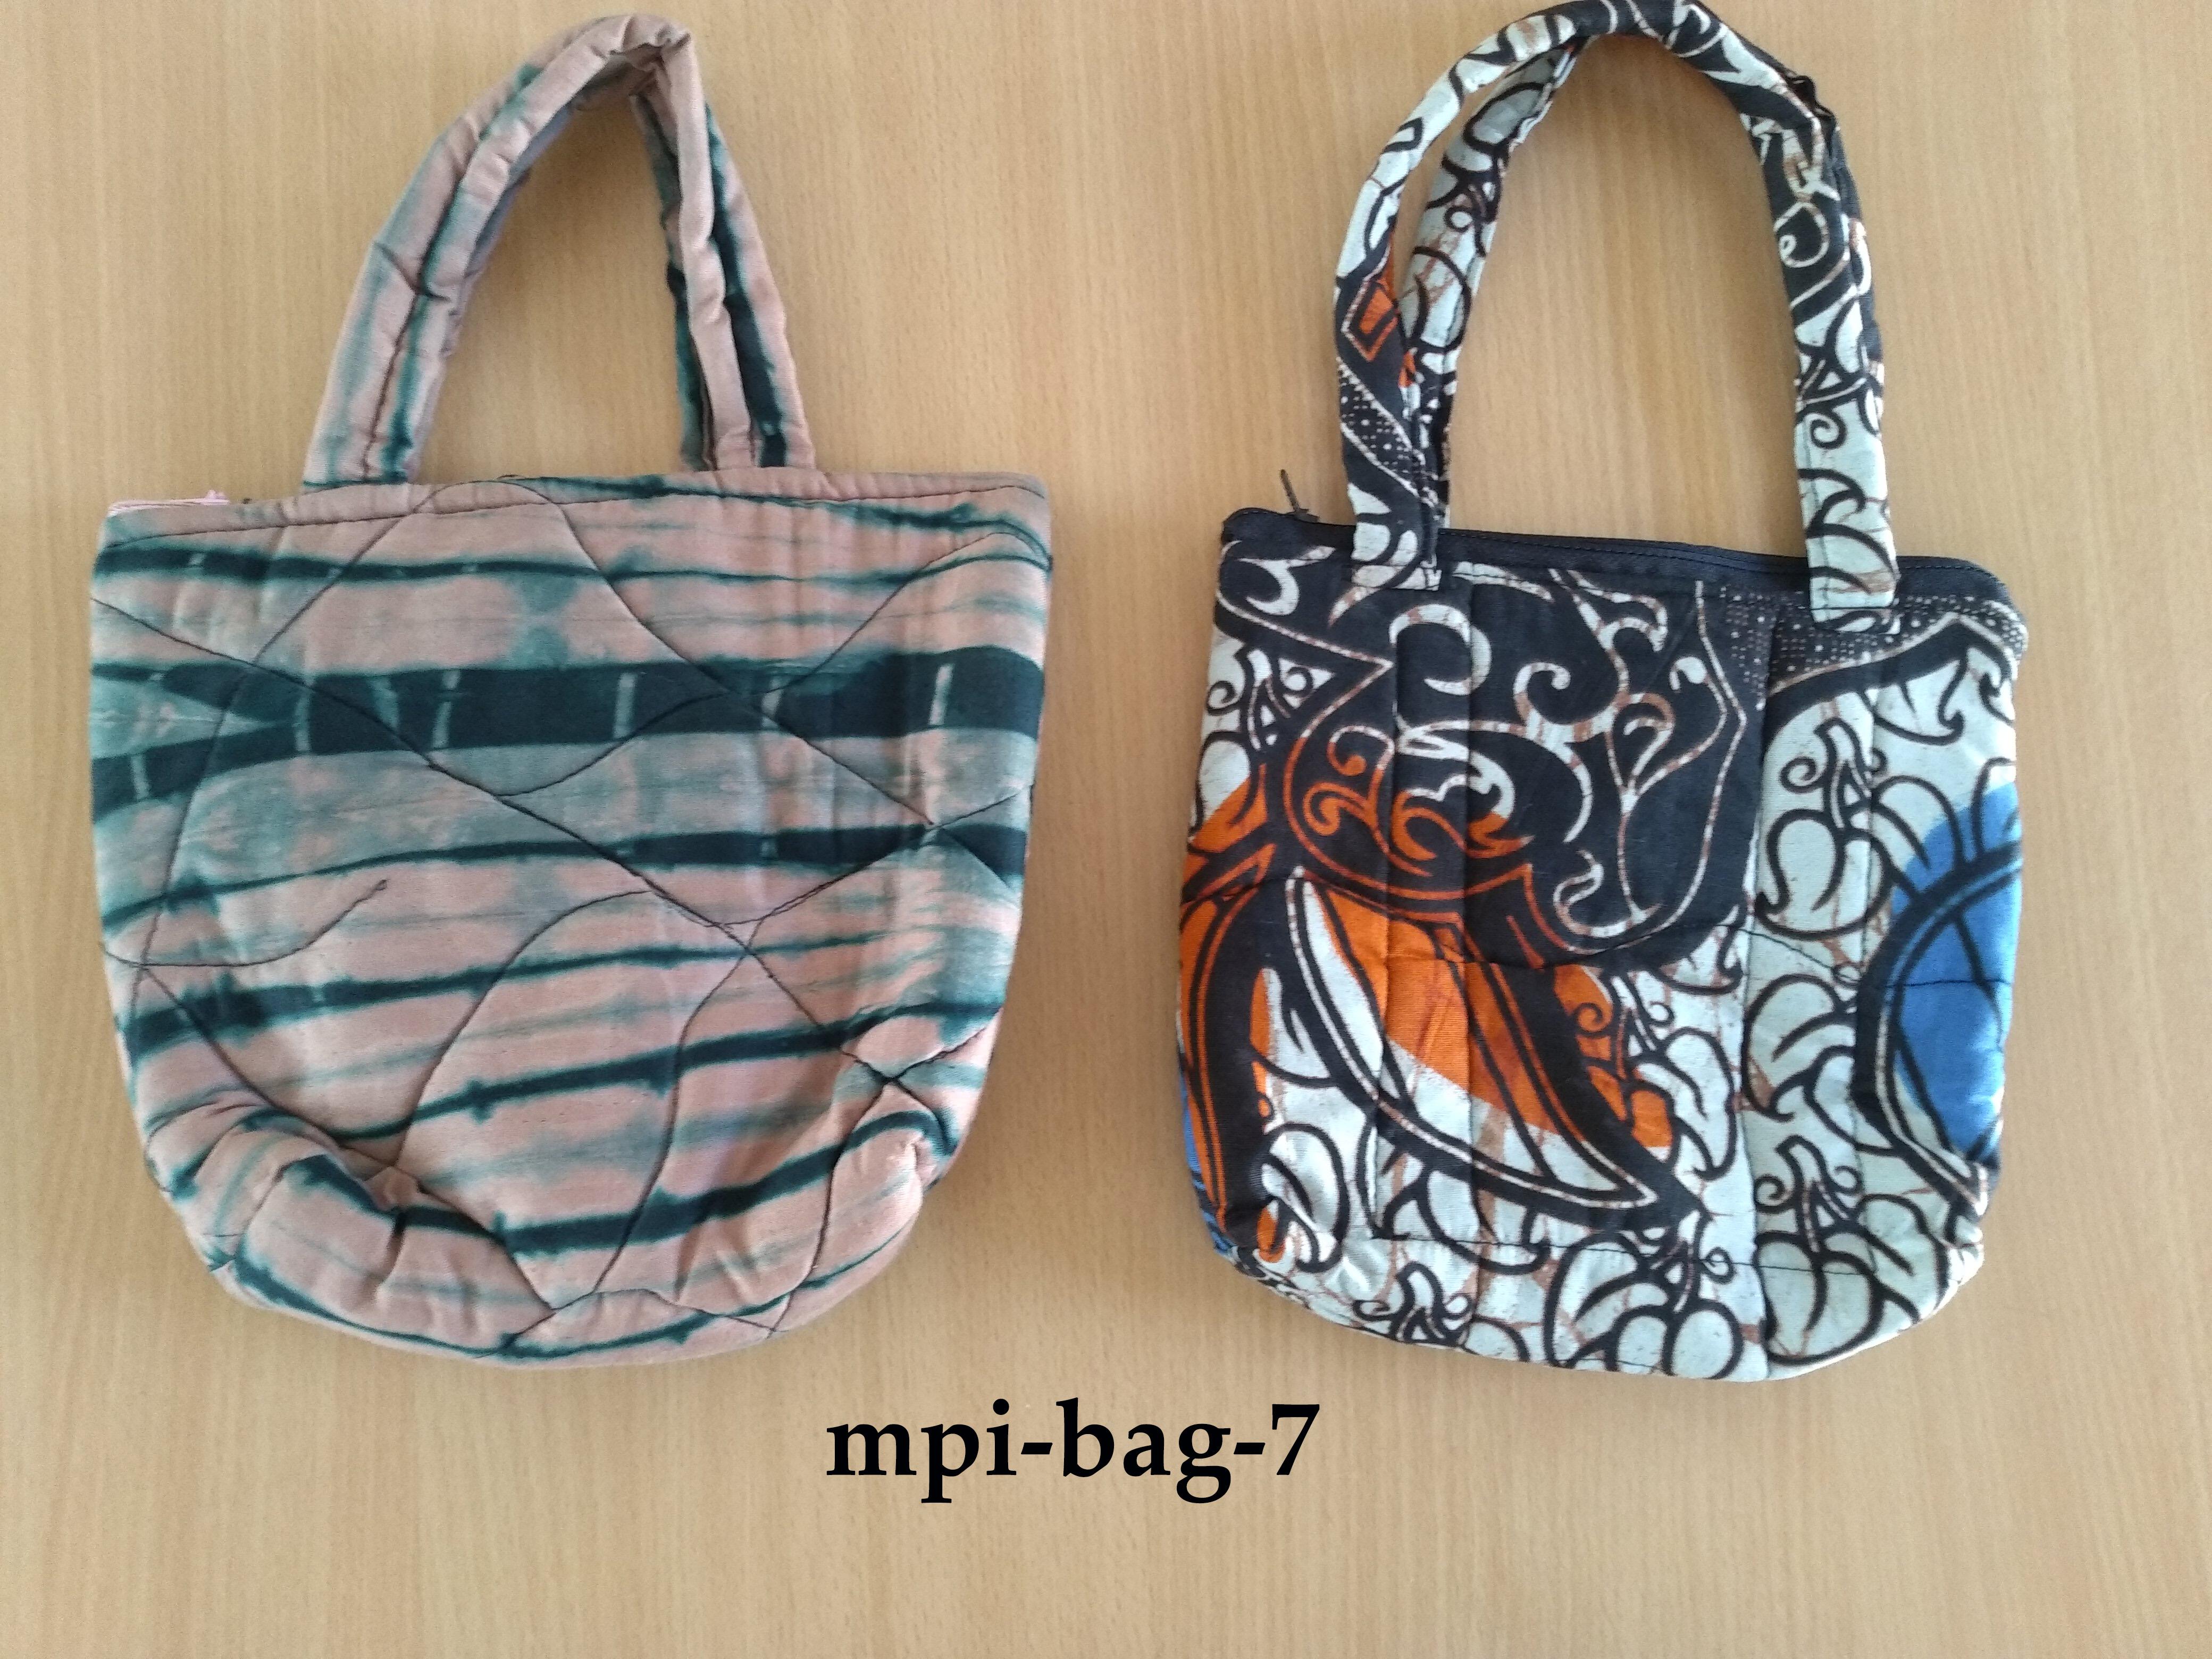 mpi-bag-7